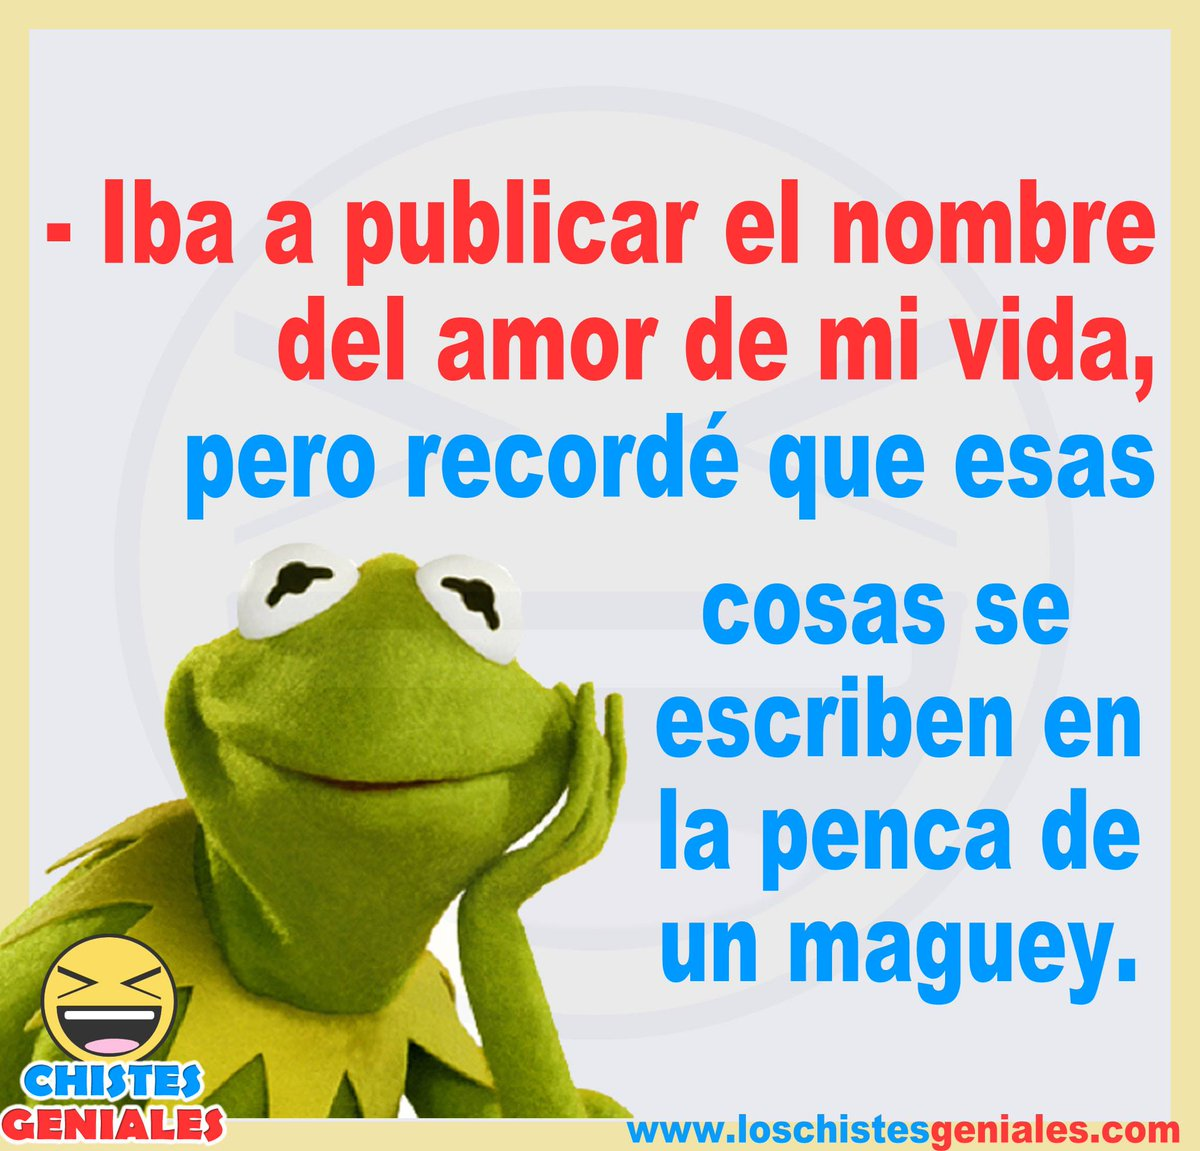 Chistes Geniales Auf Twitter El Amor De Mi Vida